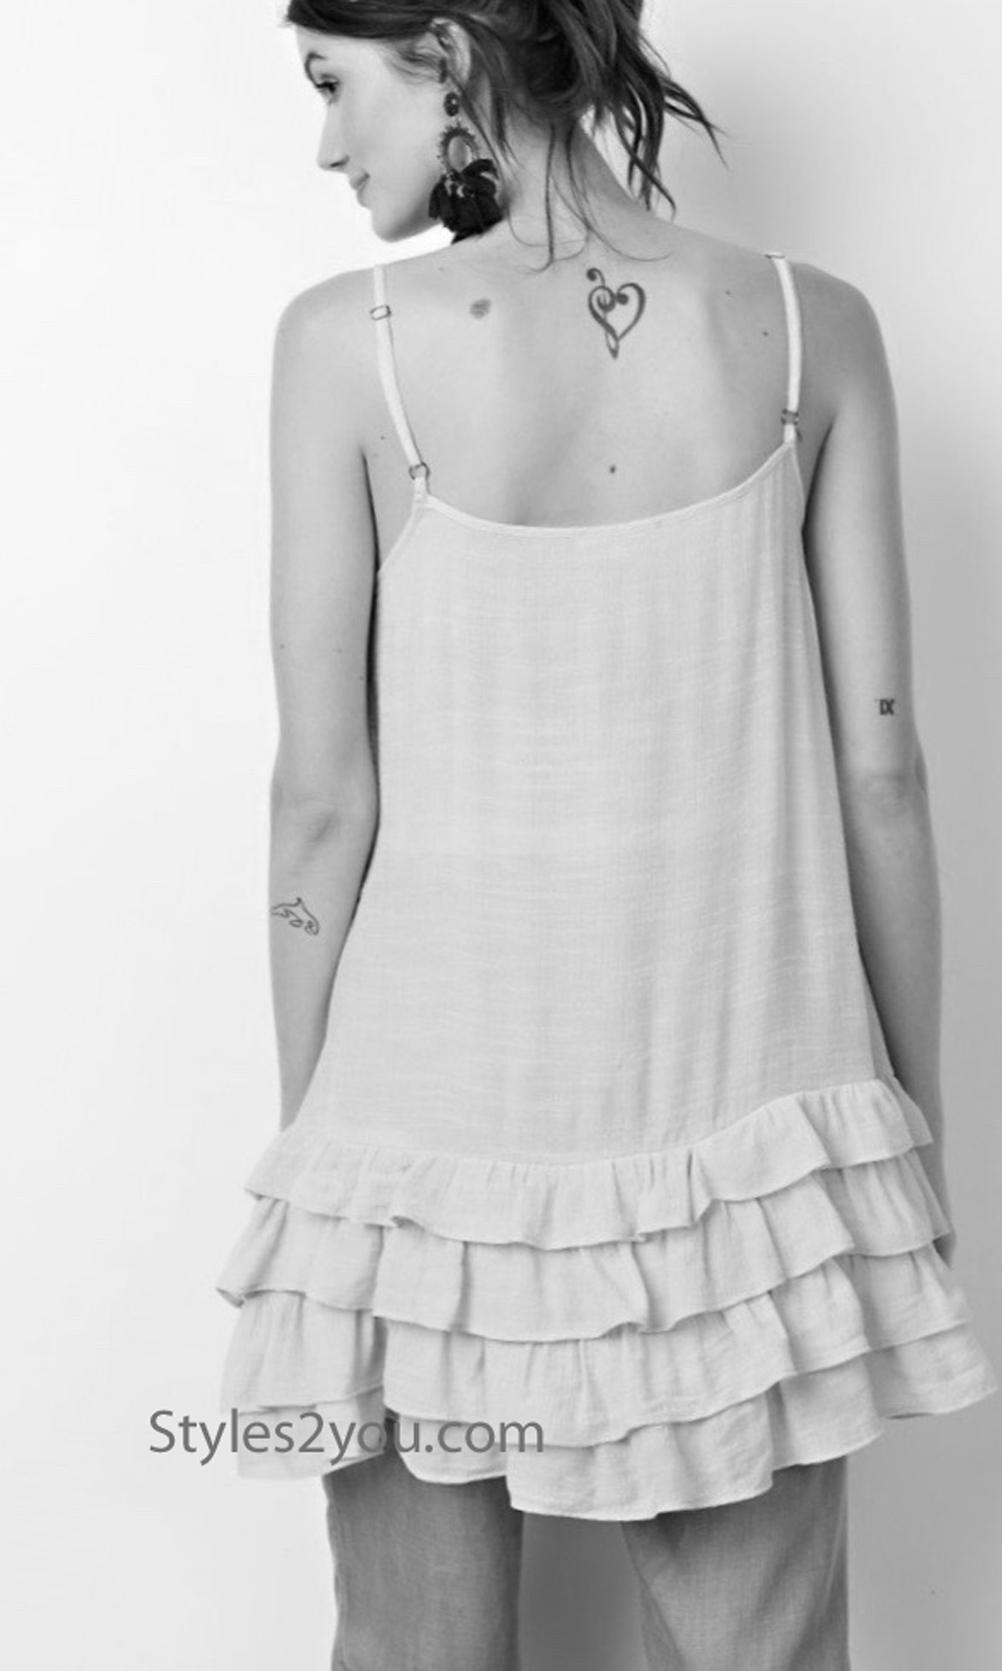 Arcadia Ruffle Layering Cami Shirt Extender Slip In Faded